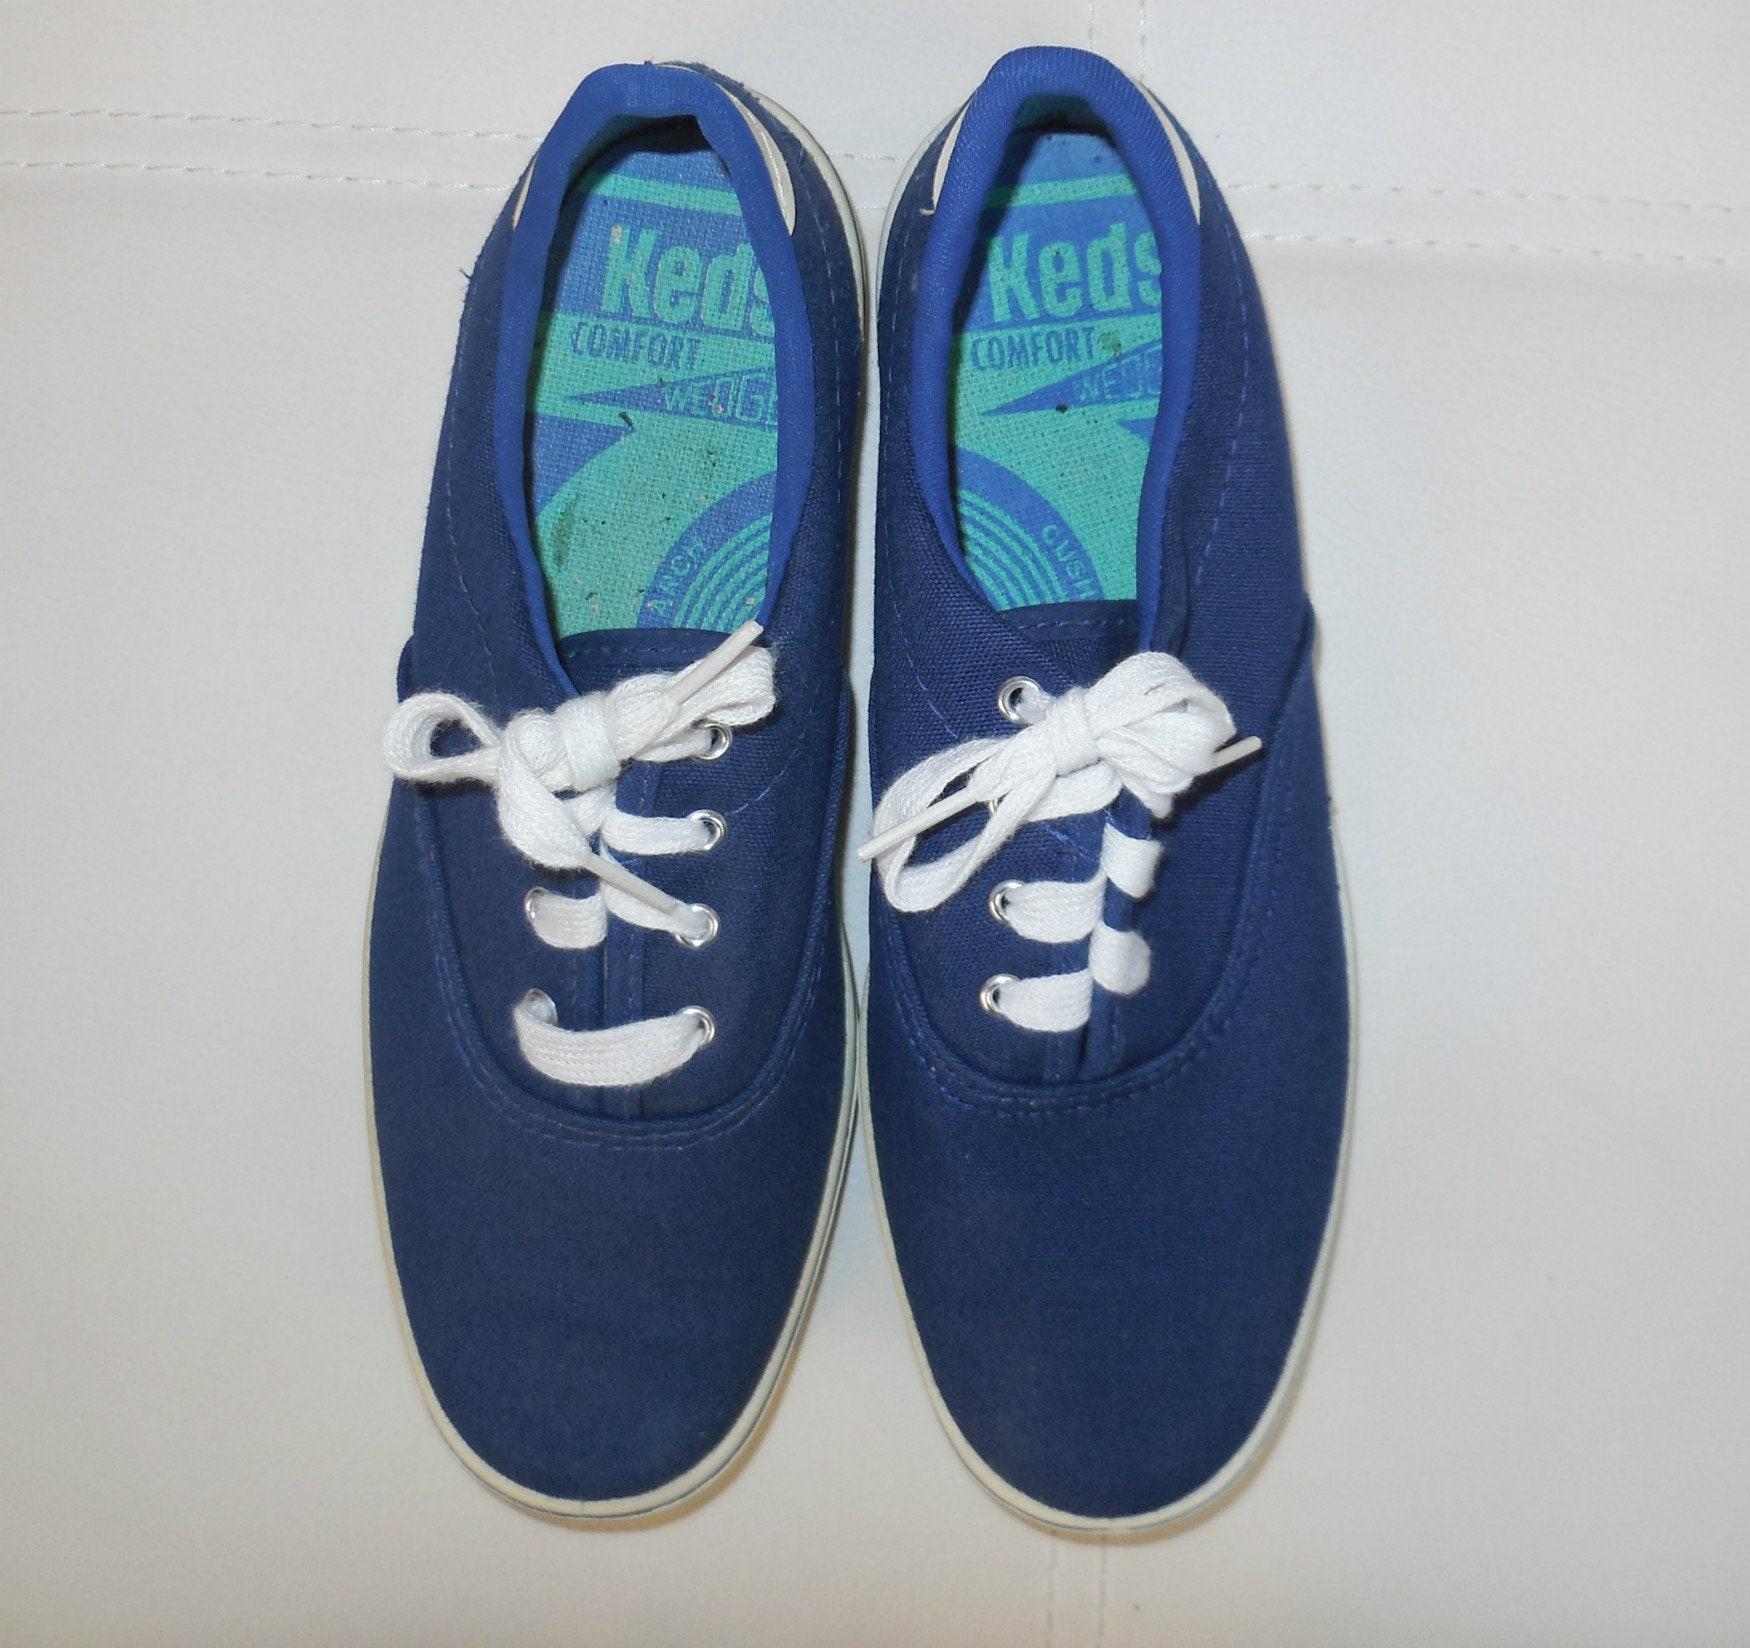 6c5747ec30f78 DEADSTOCK Vintage 1960s Keds Sunfish Tennis Shoes Sneakers Navy Blue ...